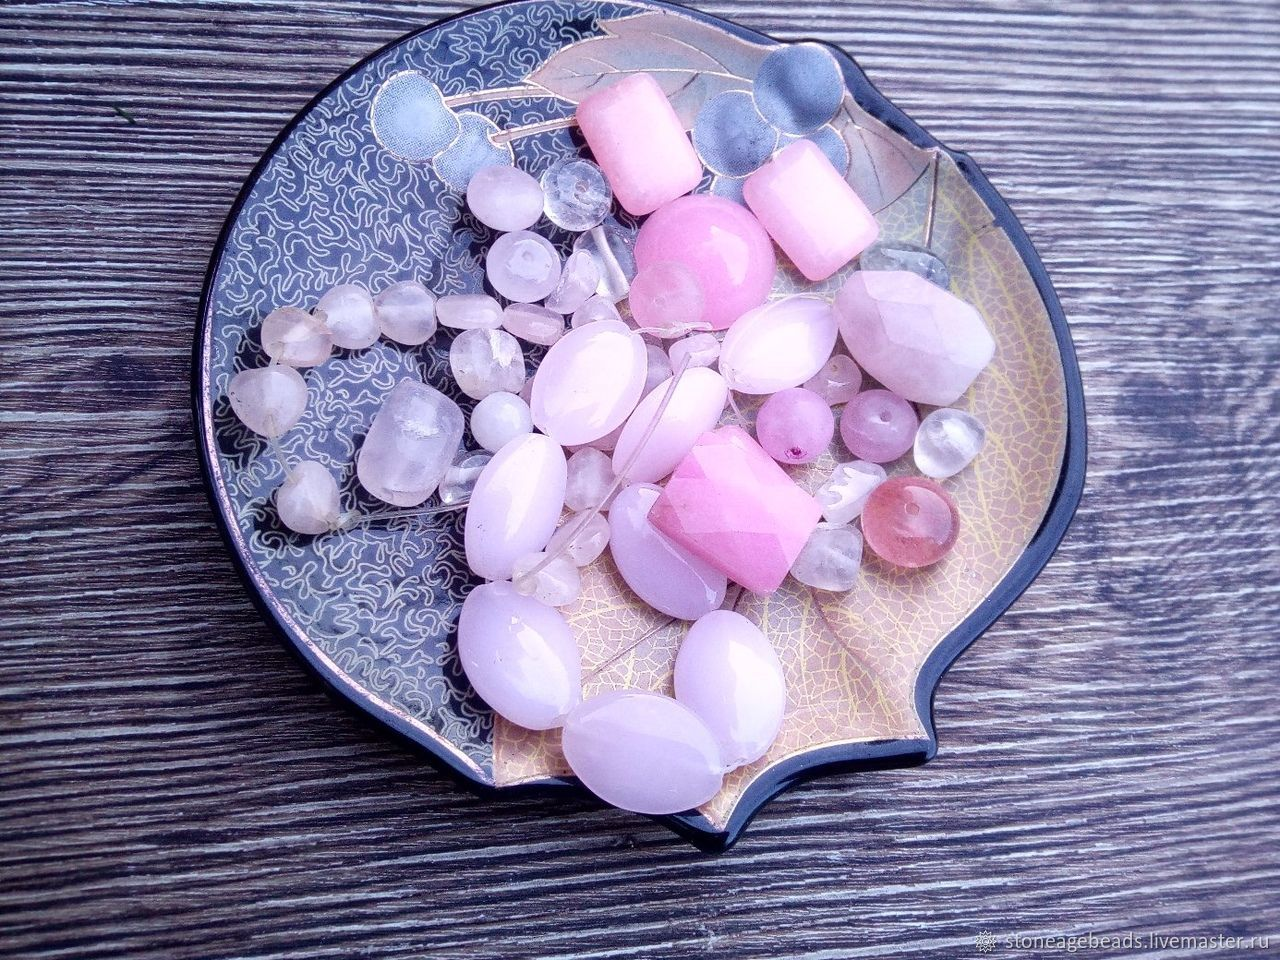 Микс бусин розовый кварц и жадеит с дефектами, Бусины, Армавир,  Фото №1